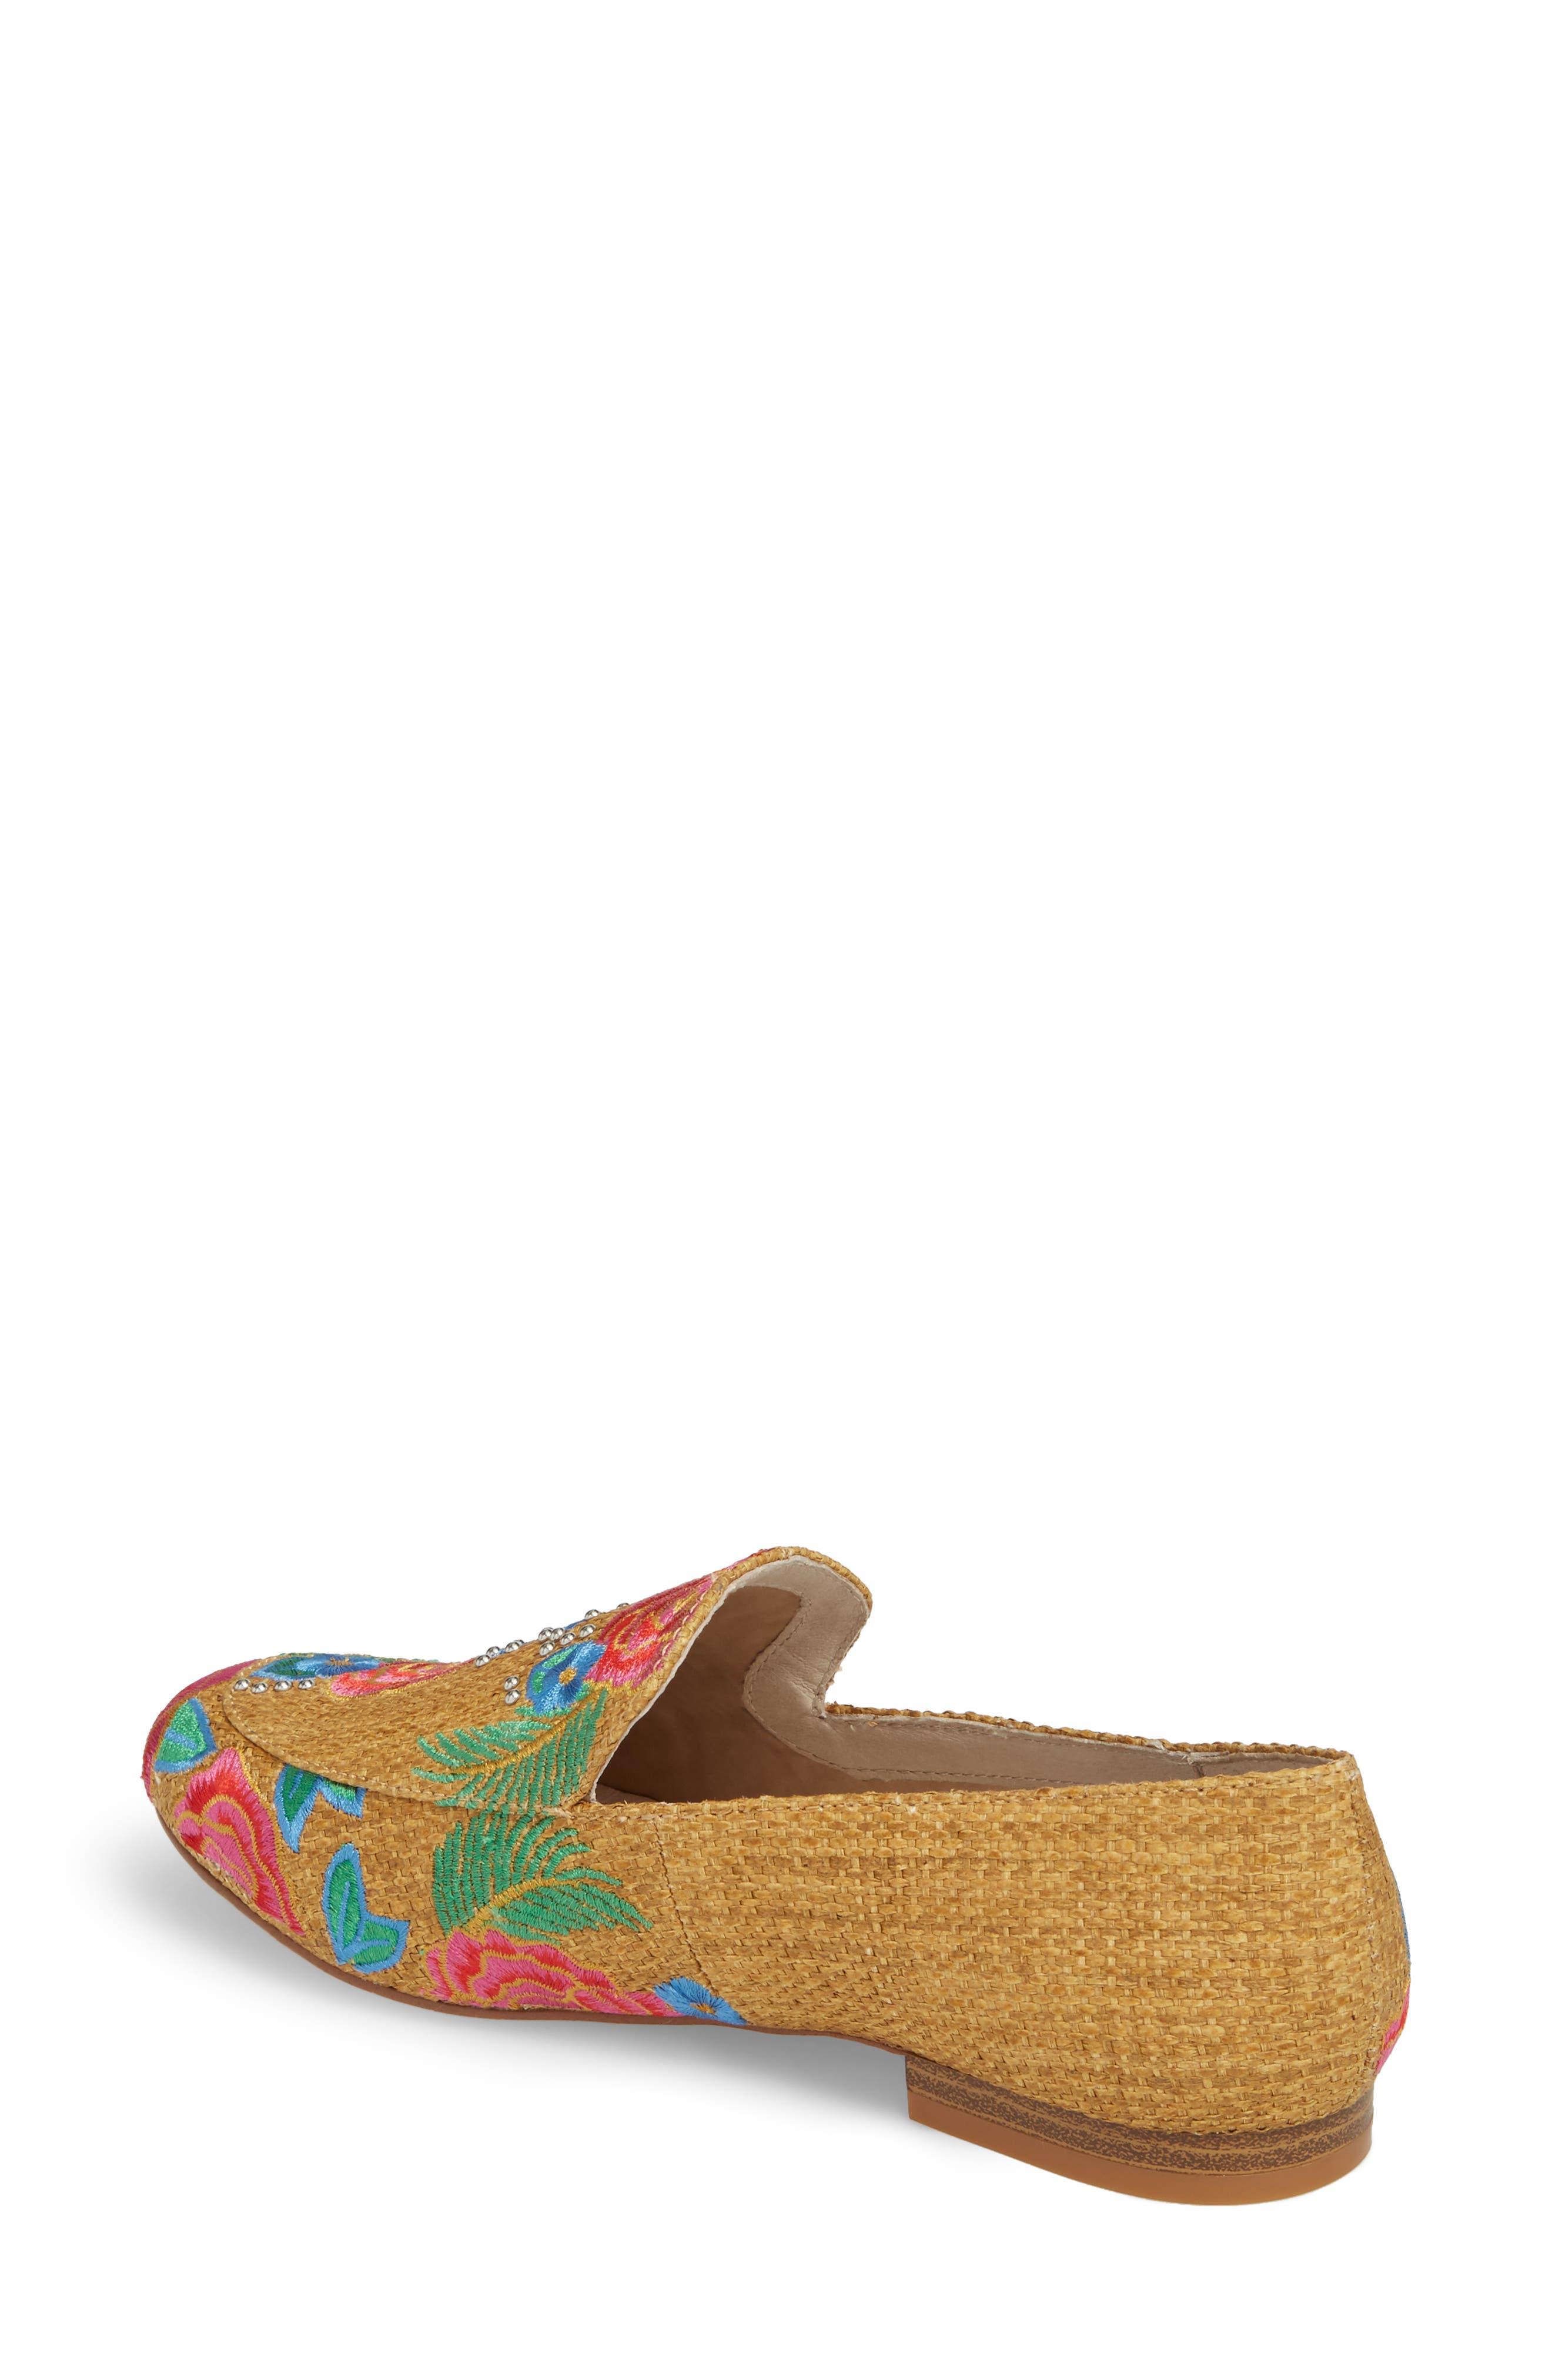 Westley Slip-On,                             Alternate thumbnail 2, color,                             Natural Raffia Fabric